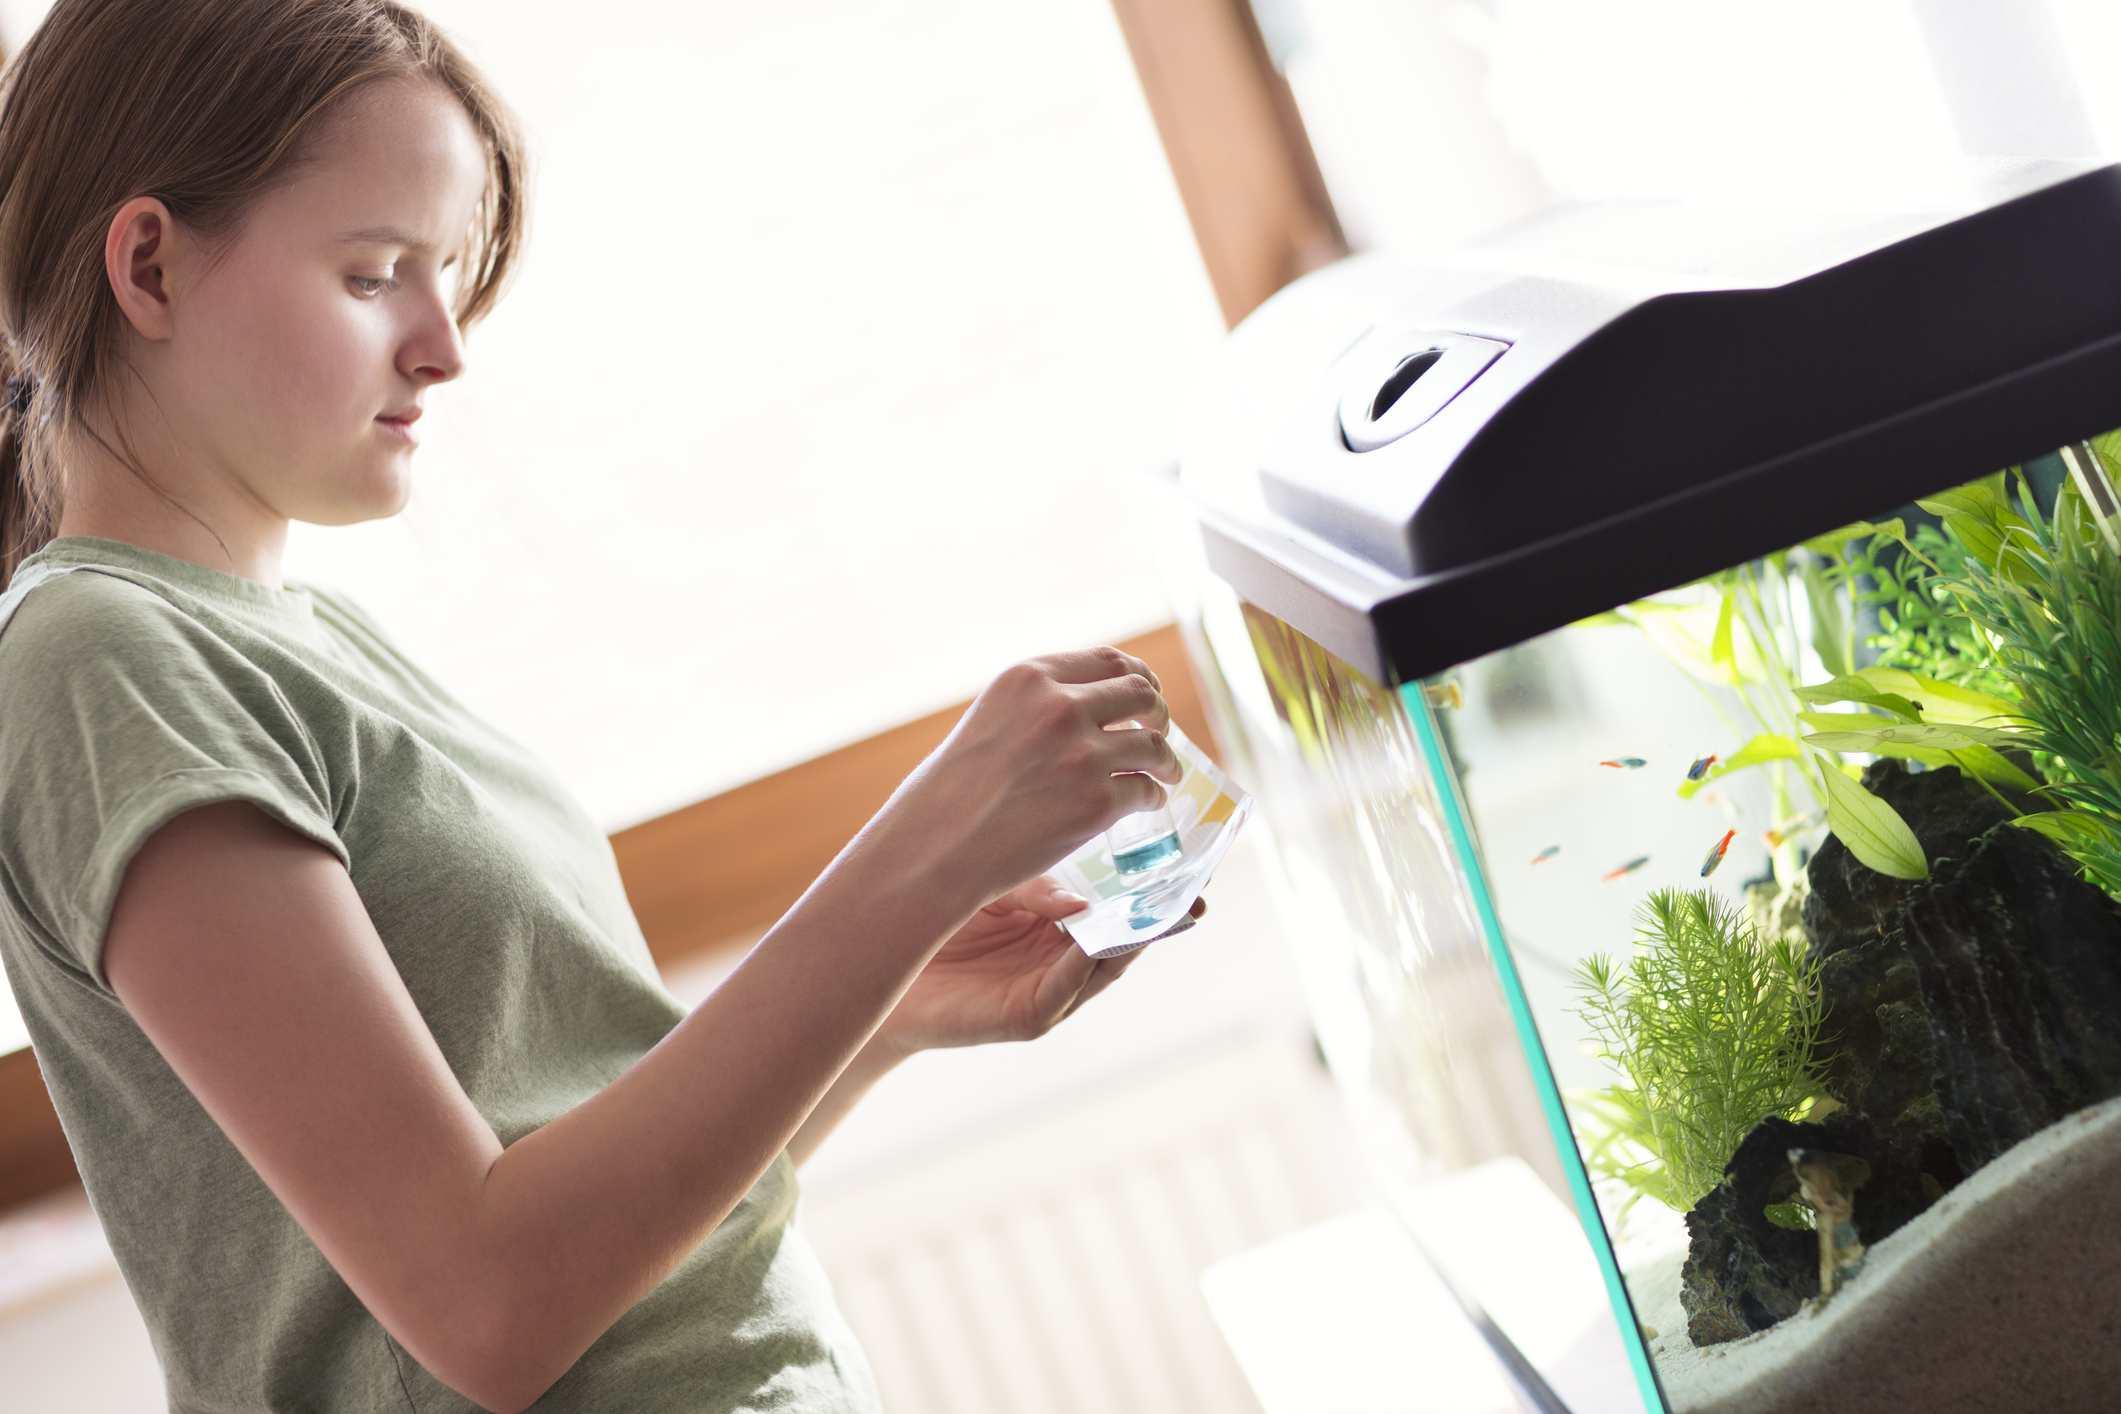 A woman testing pH levels in aquarium